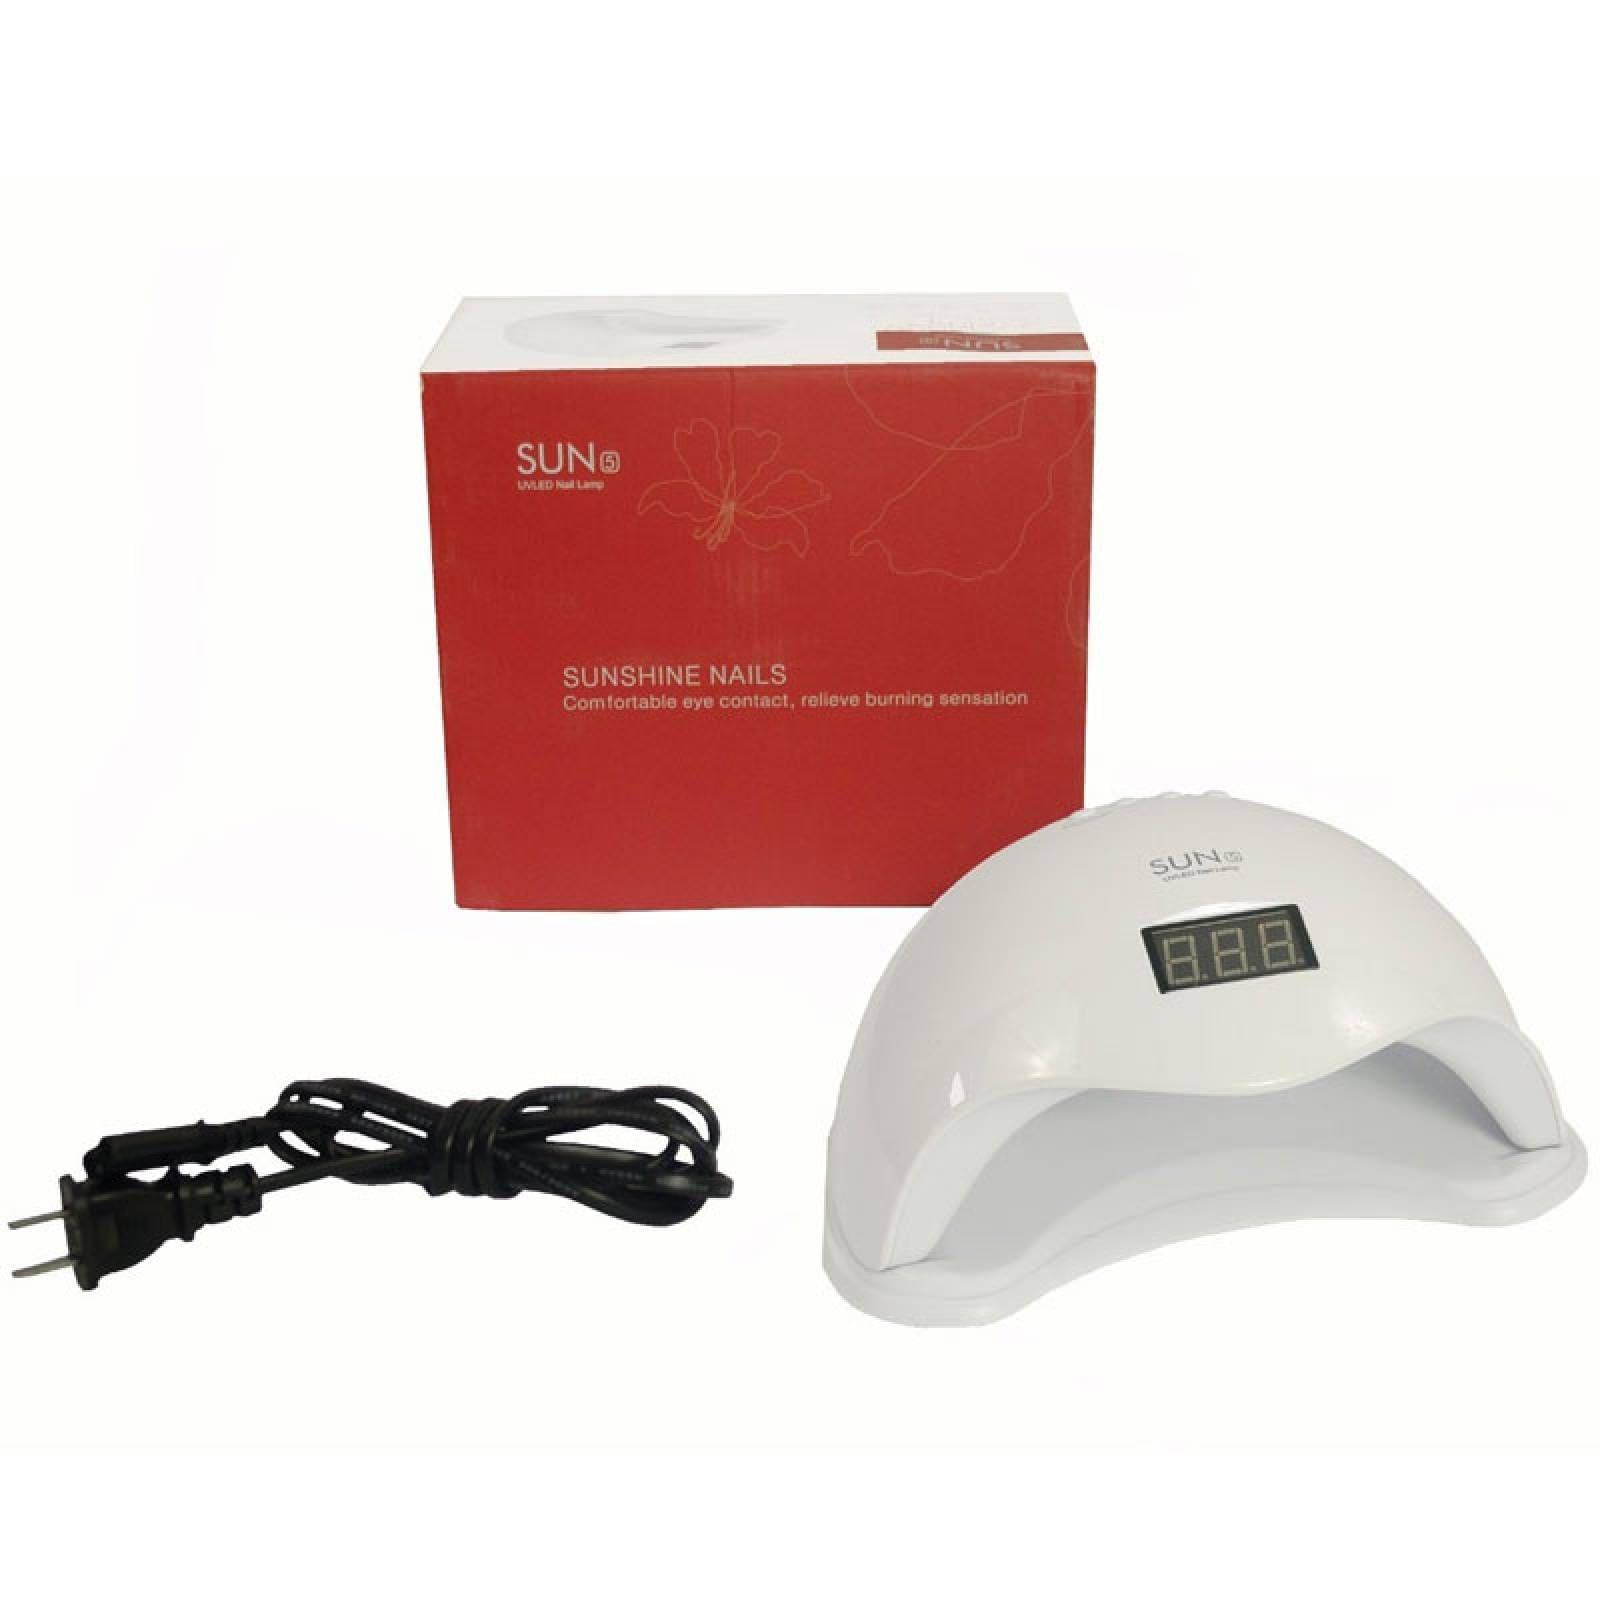 Lampara Uv Uñas Profesional Digital Gelish Spa 48 Watts Led